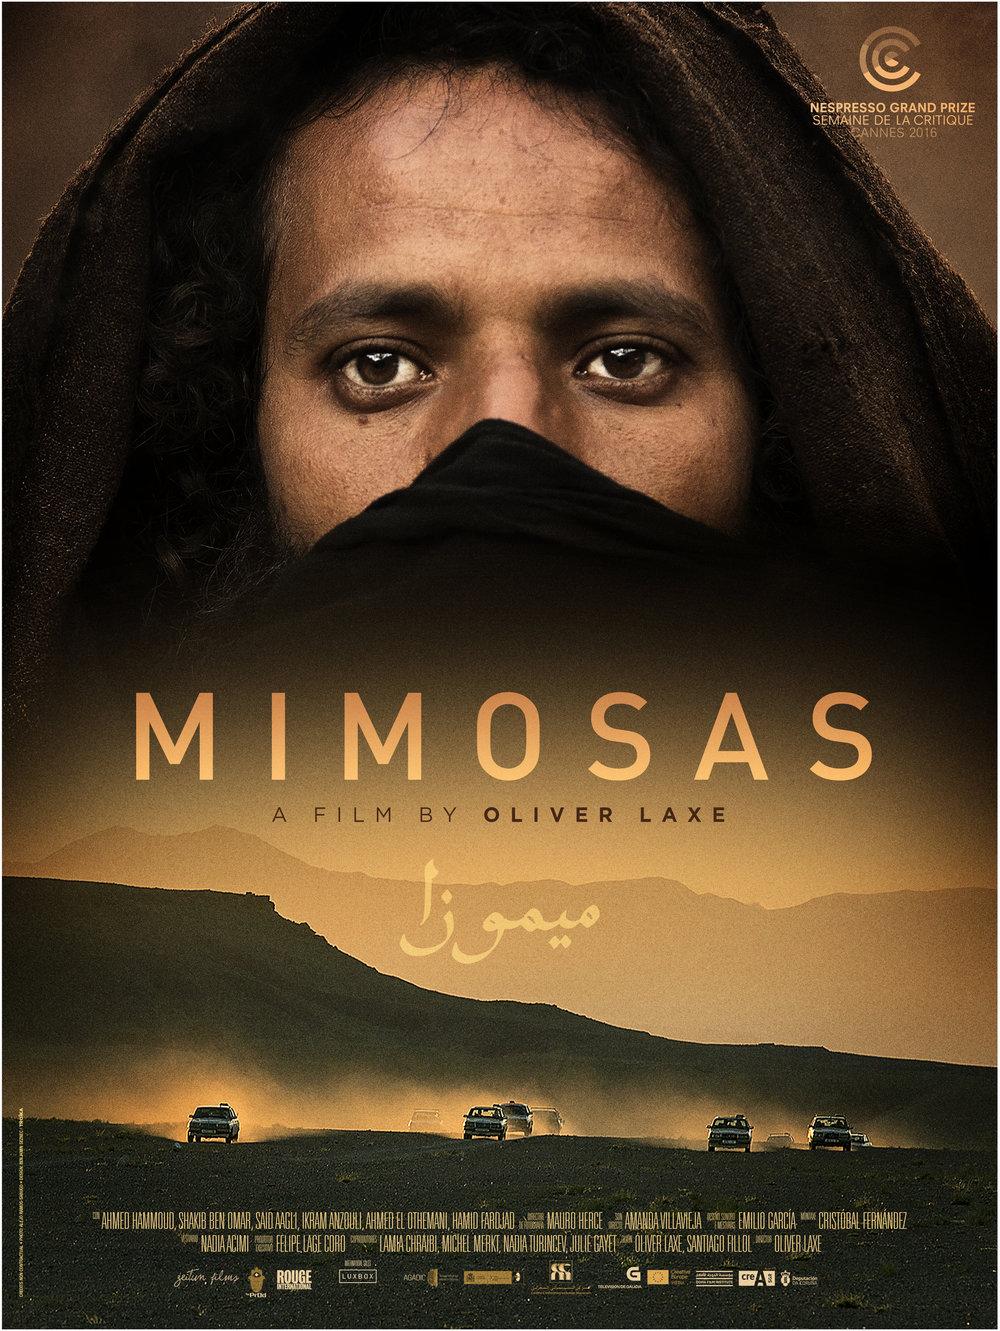 Poster 120x160 Mimosas prix nespresso.jpg